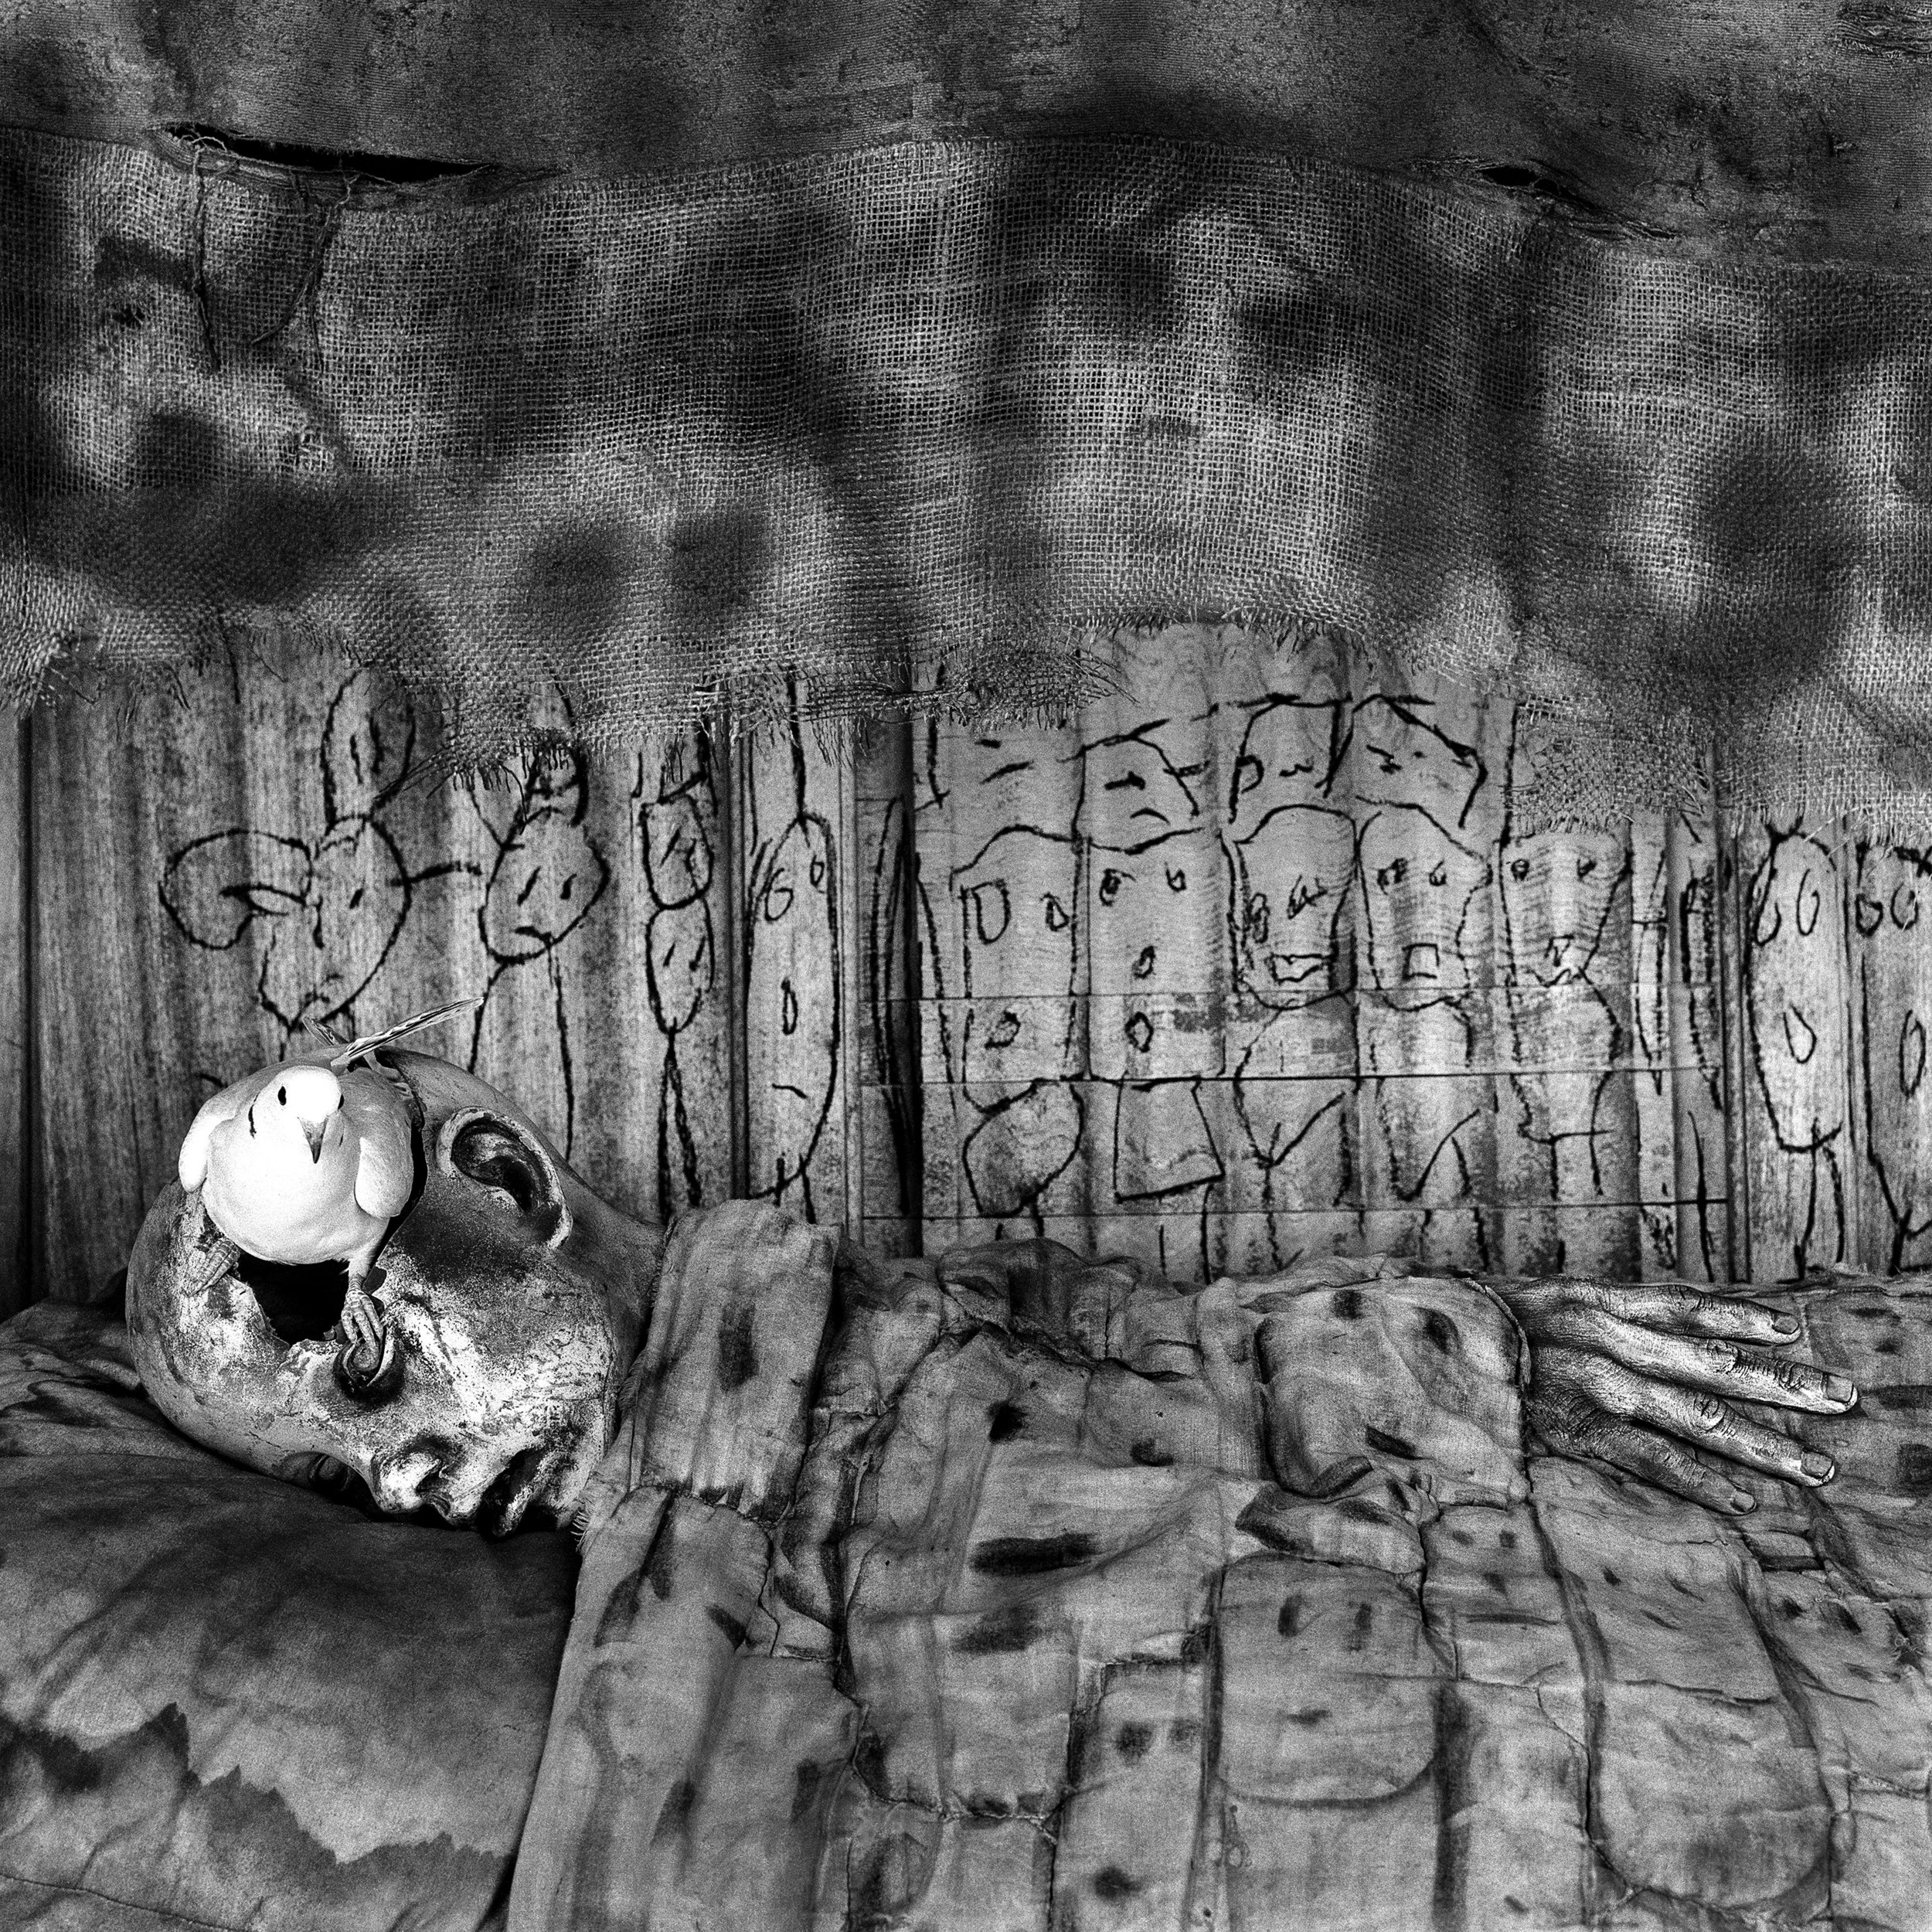 DEATHBED (2010). CREDIT: ROGER BALLEN